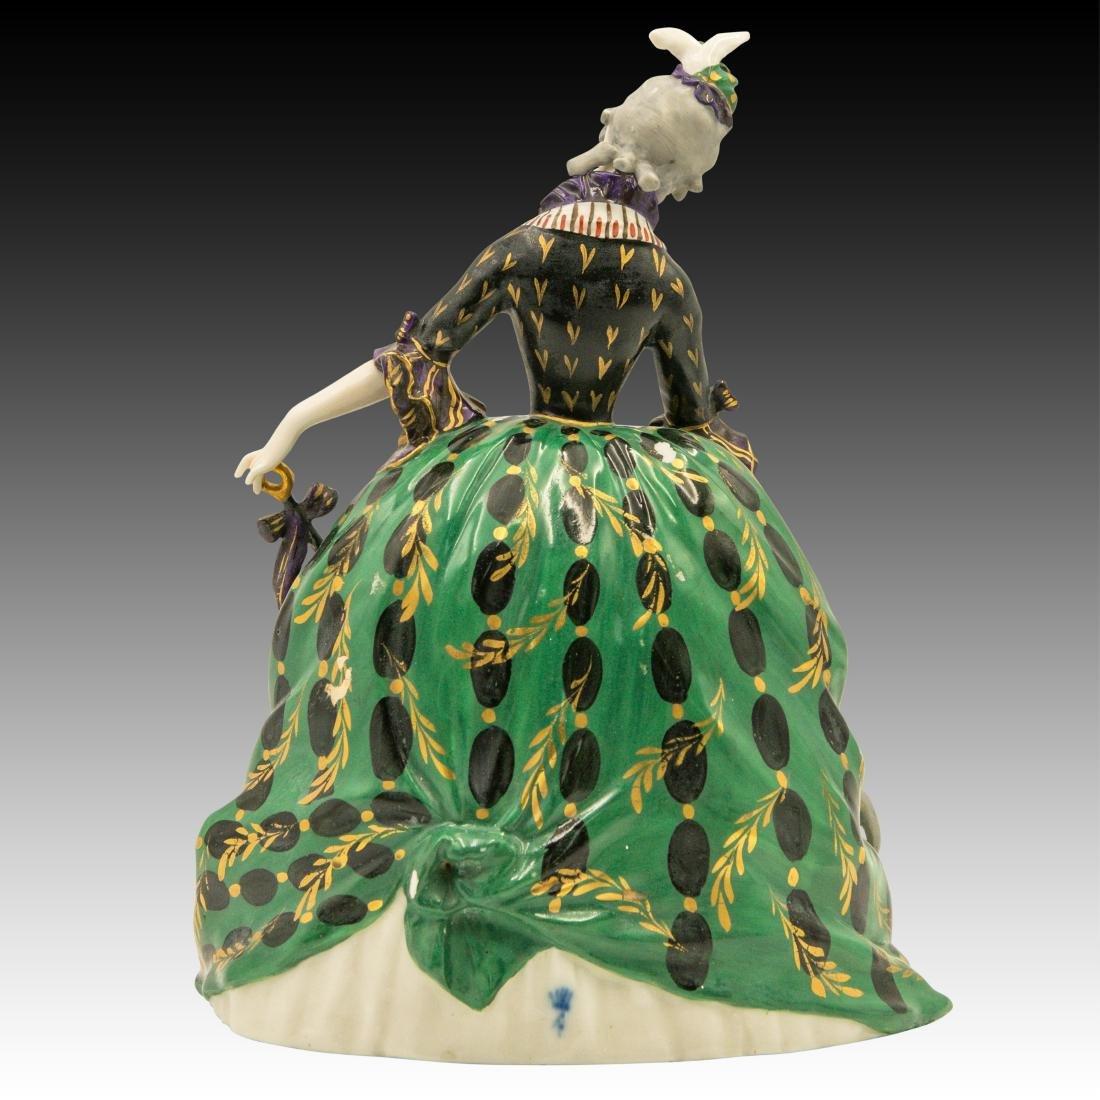 Polychrome Figurine Woman and her Greyhound - 3